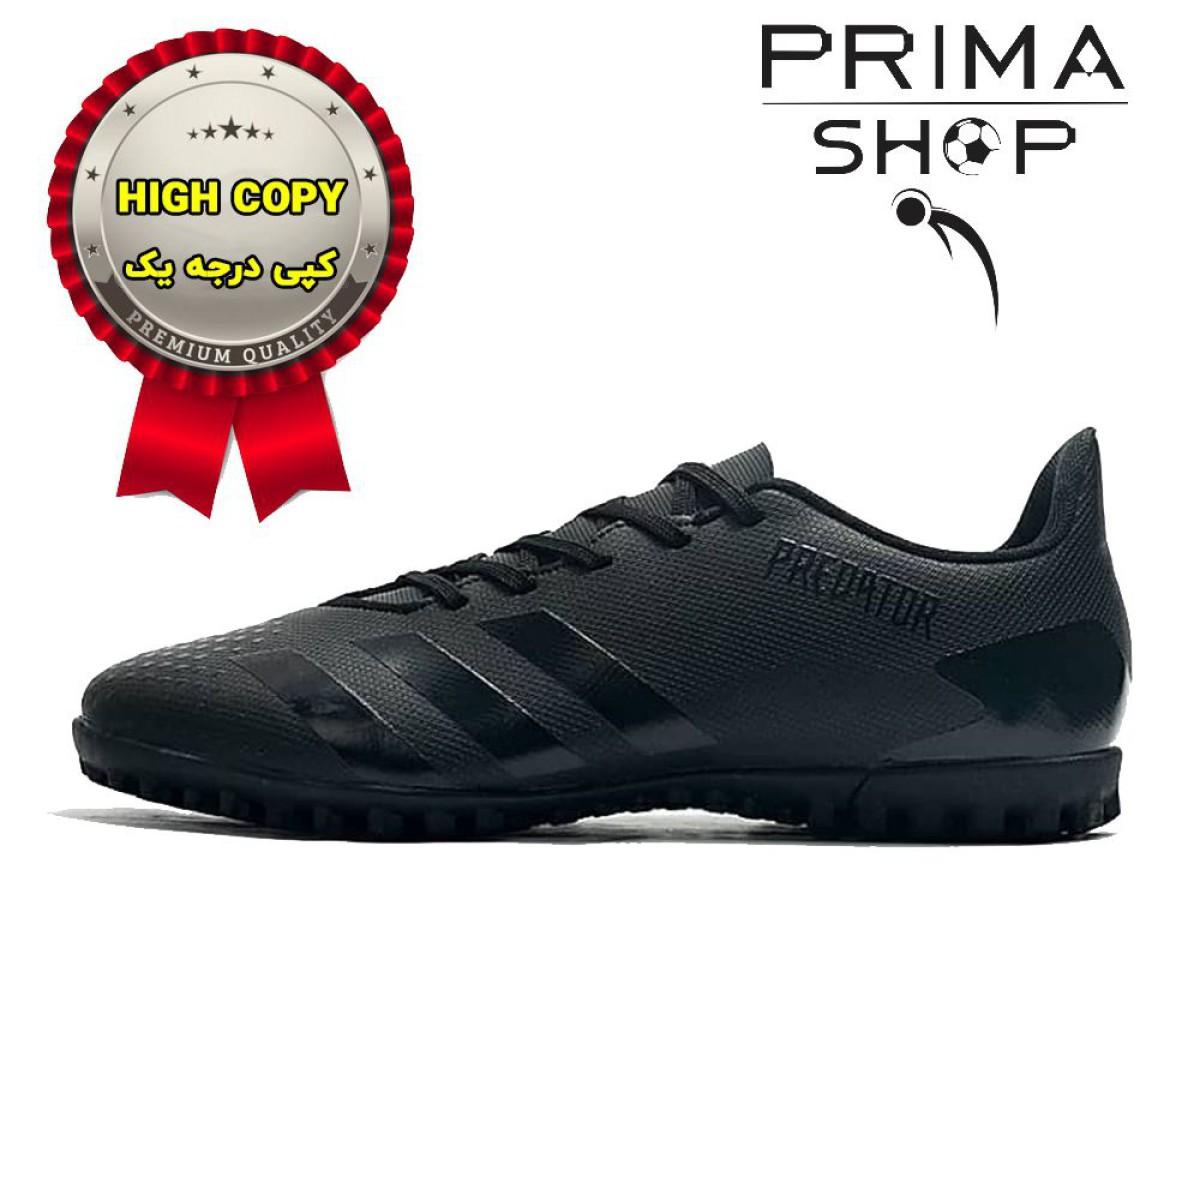 کفش چمن مصنوعی آدیداس پردیتور 20.4 مشکی های کپی